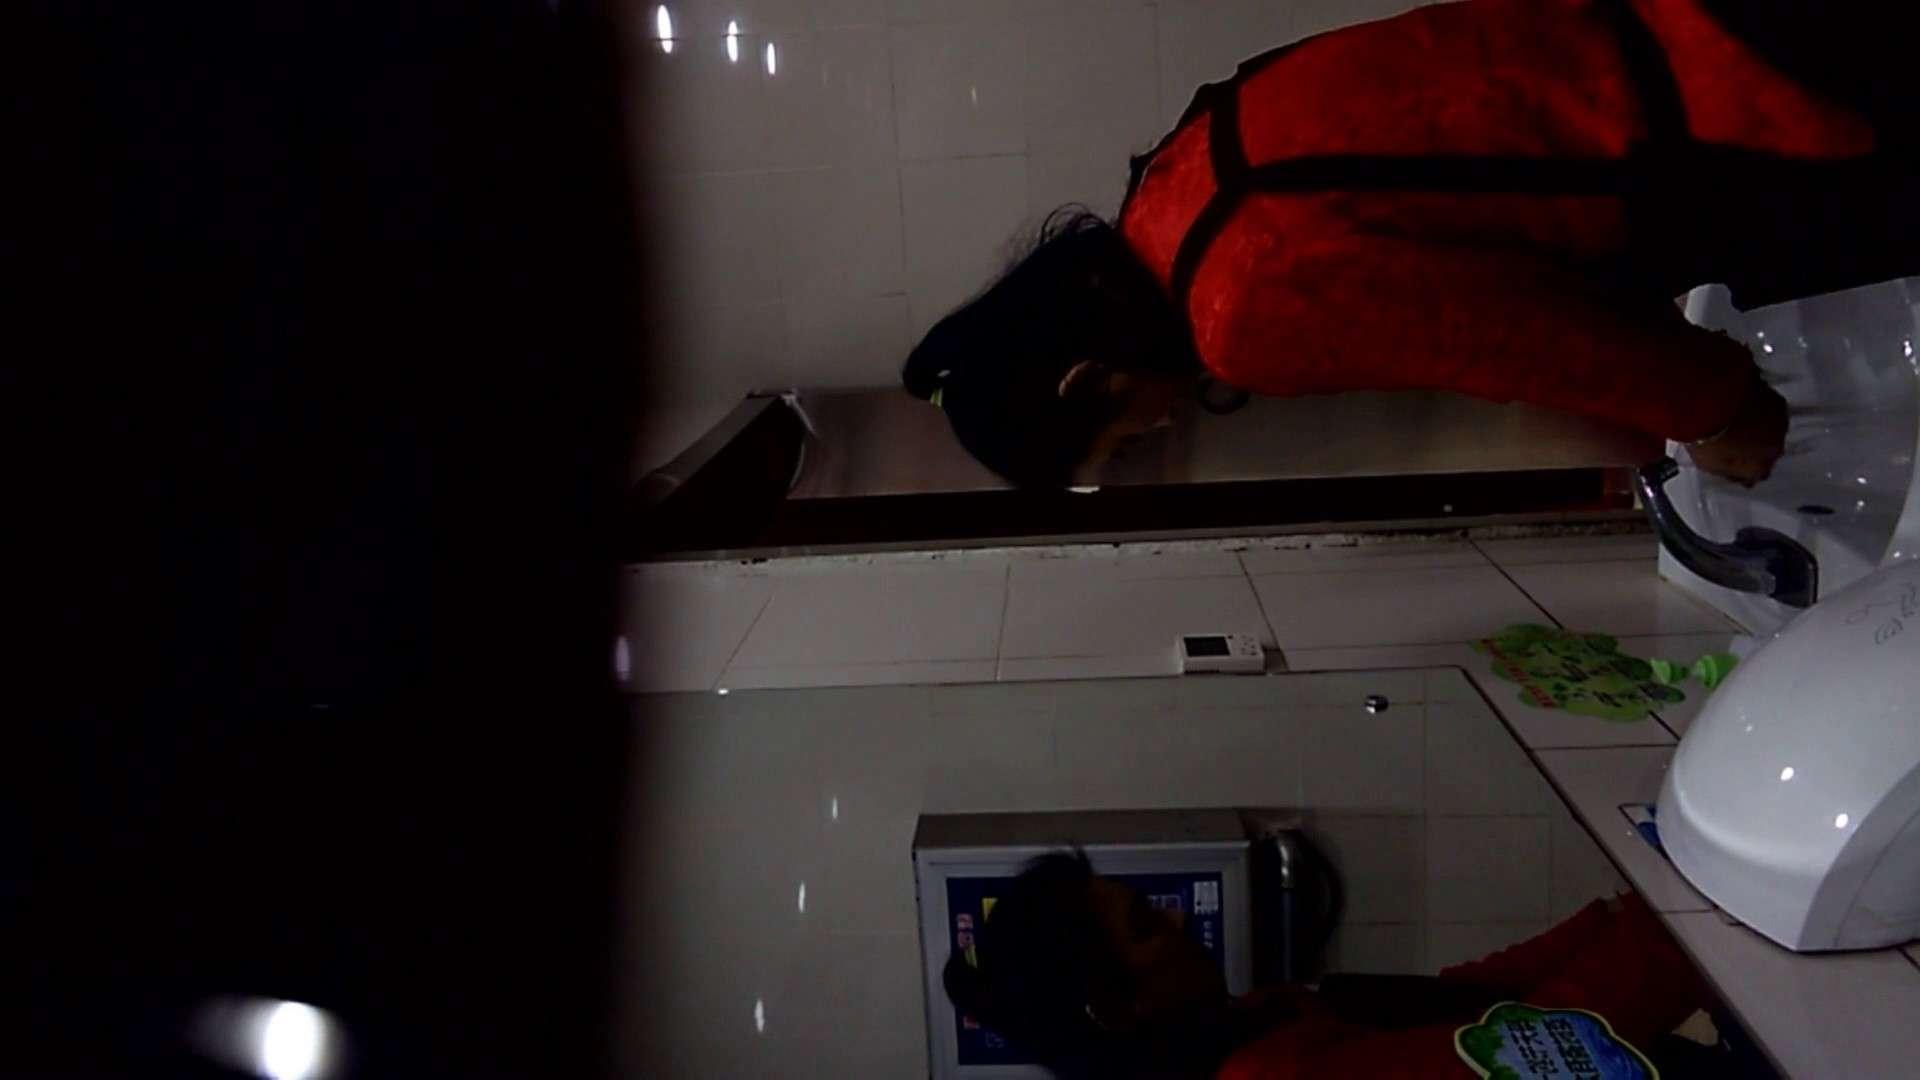 芸術大学ガチ潜入盗撮 JD盗撮 美女の洗面所の秘密 Vol.105 丸見え  100PIX 78